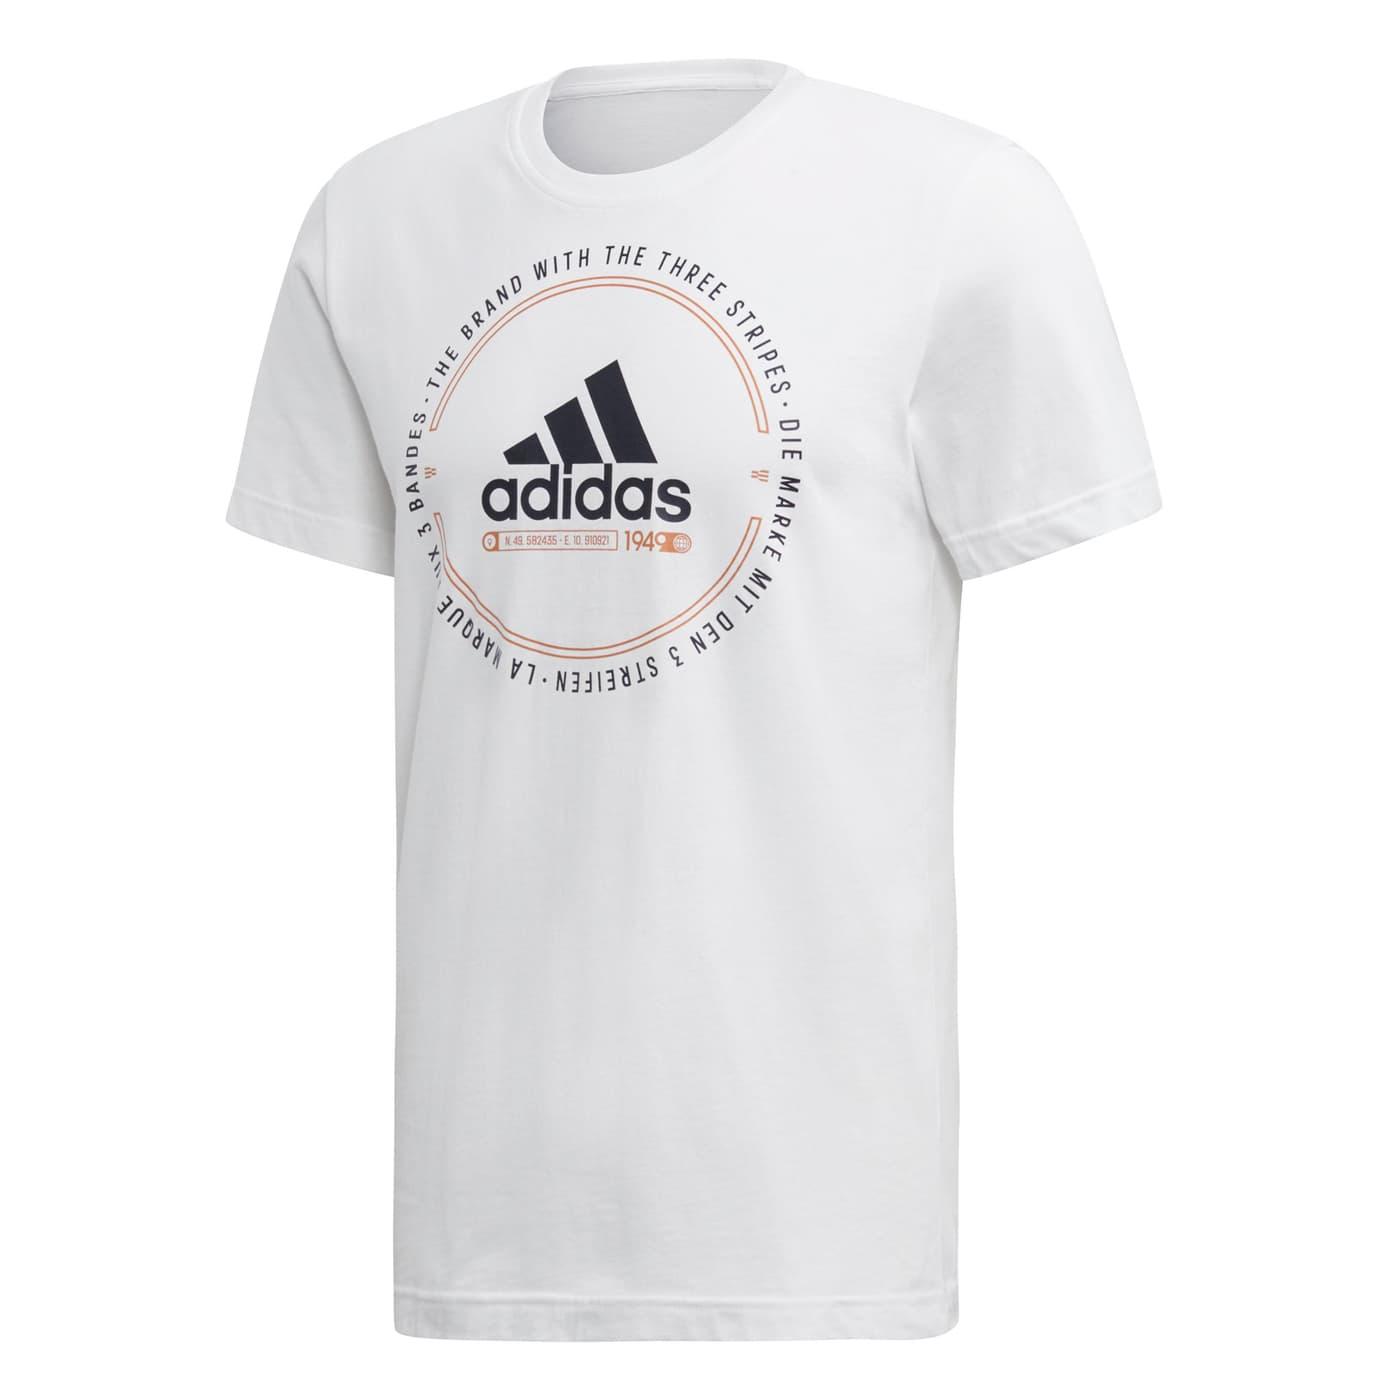 tee shirt homme marque adidas